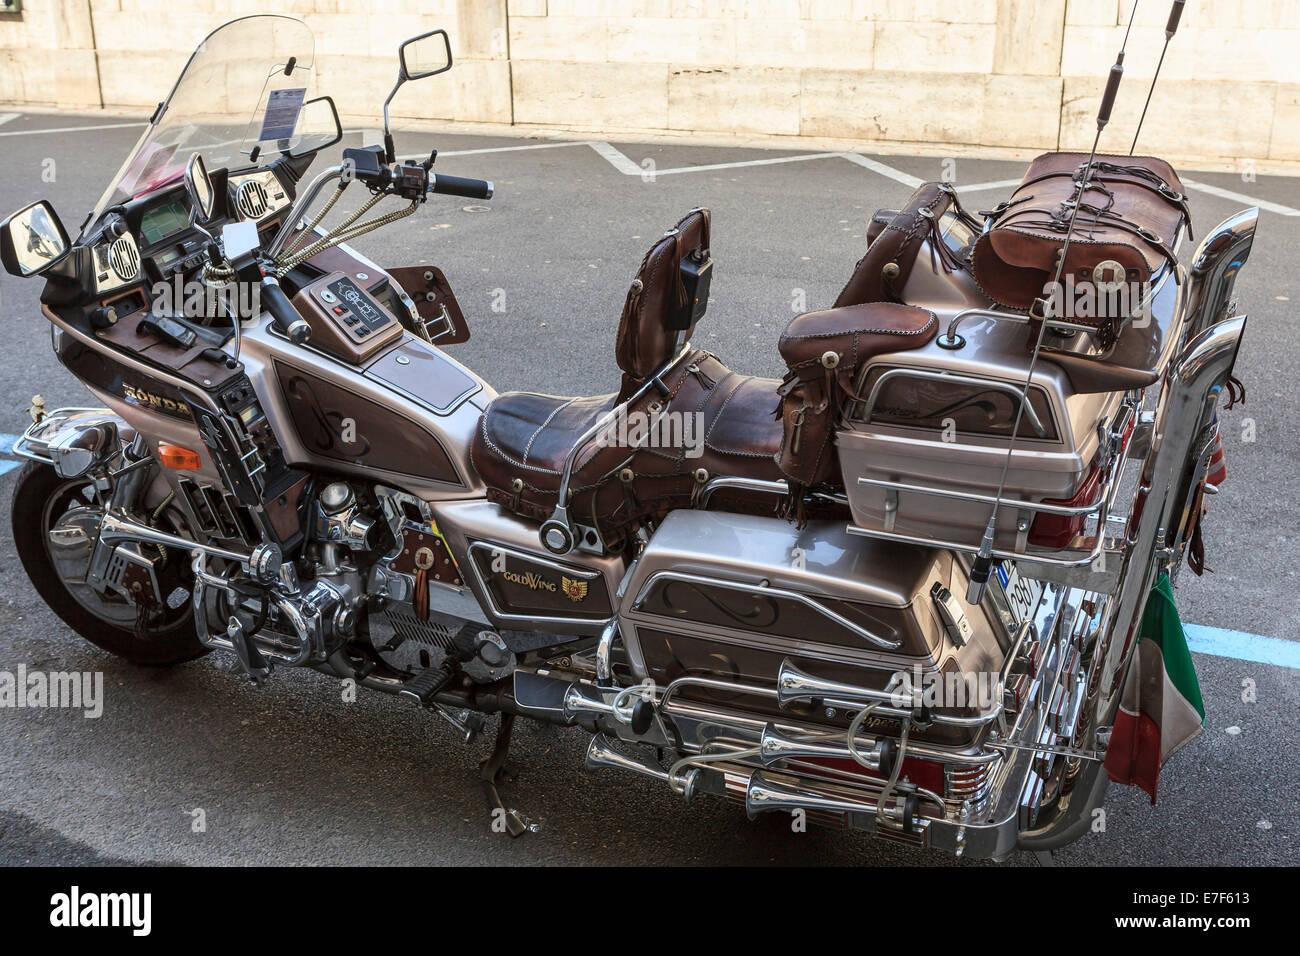 parked honda goldwing motorcycle, liguria, sanremo, italy stock